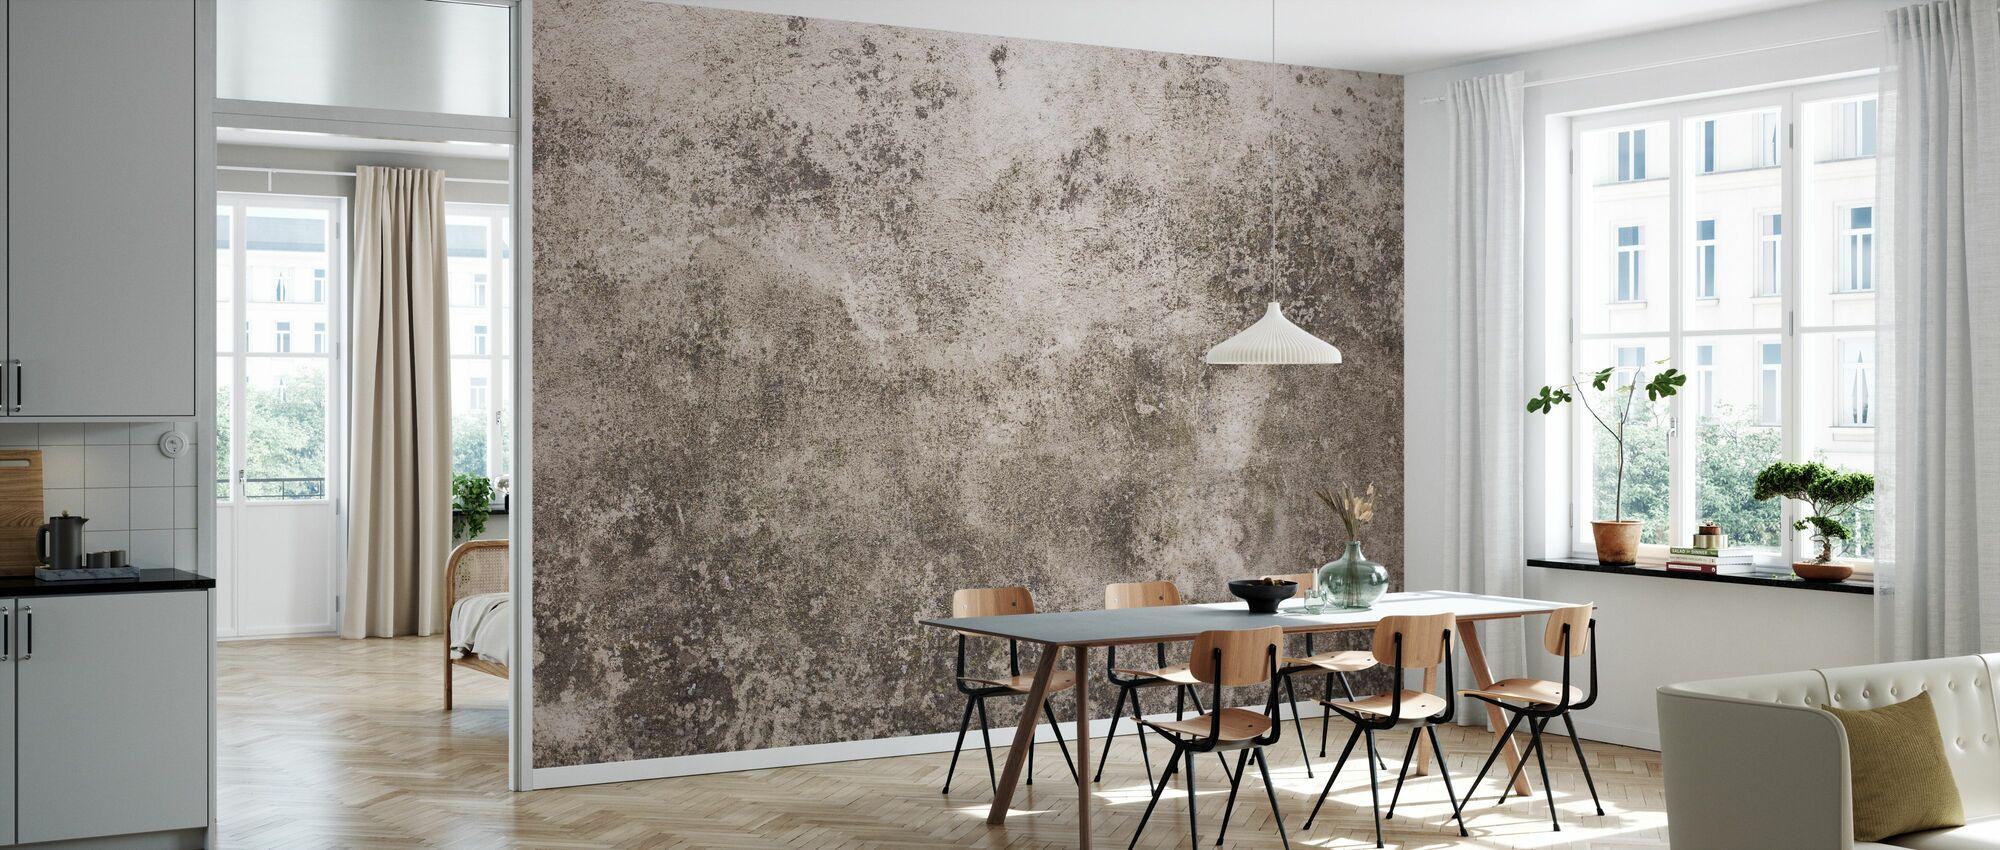 Textured Brixton Wall - Wallpaper - Kitchen